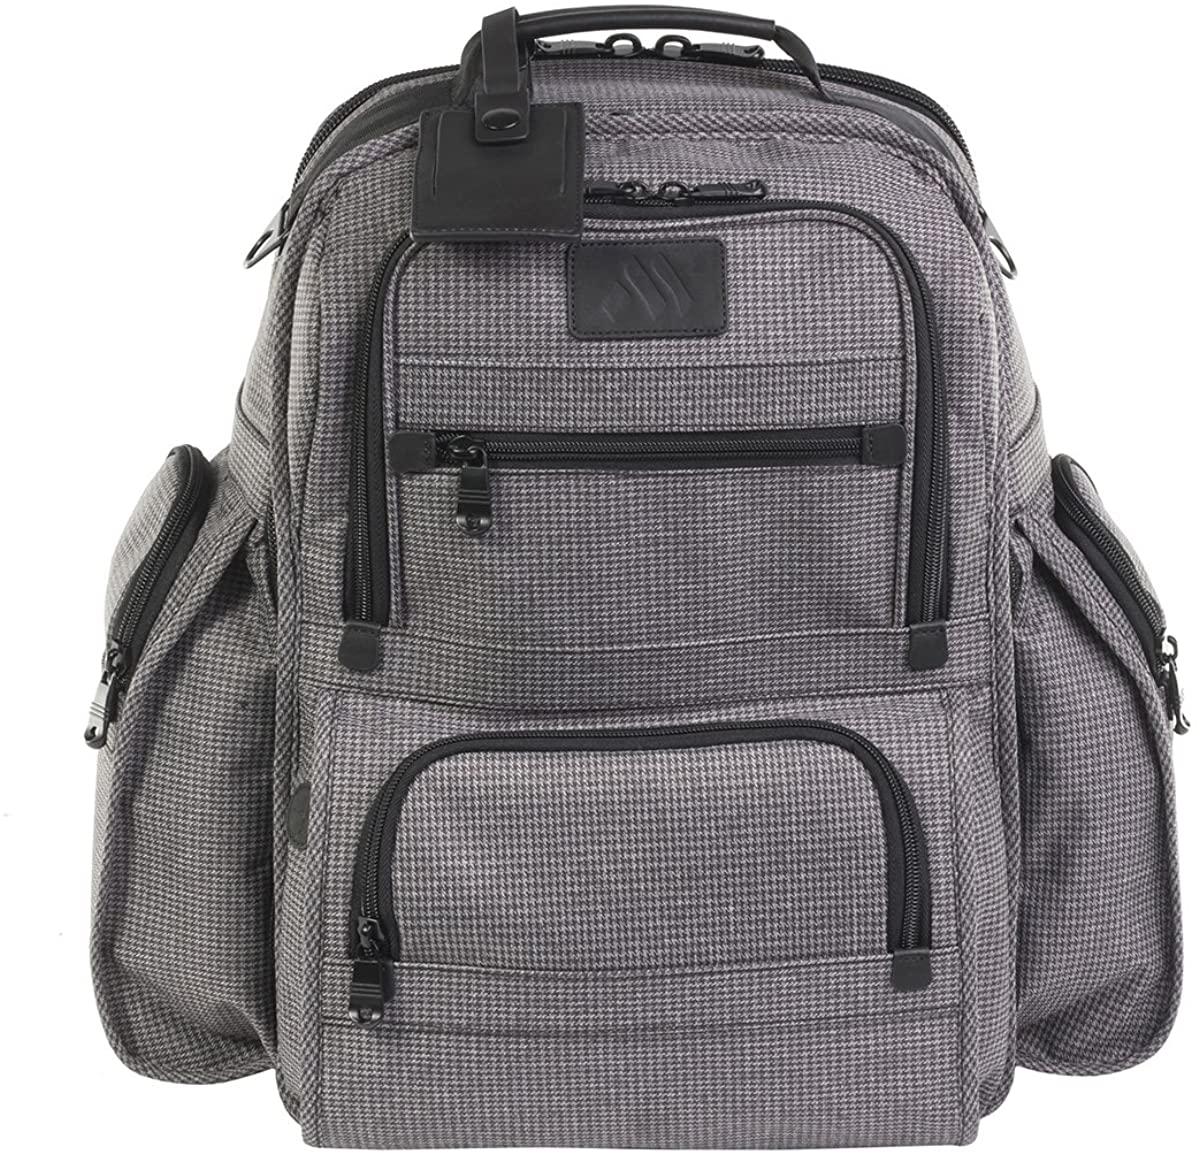 MACHIR Business Backpack Travel Laptop Backpack Slim Durable Laptops Backpack